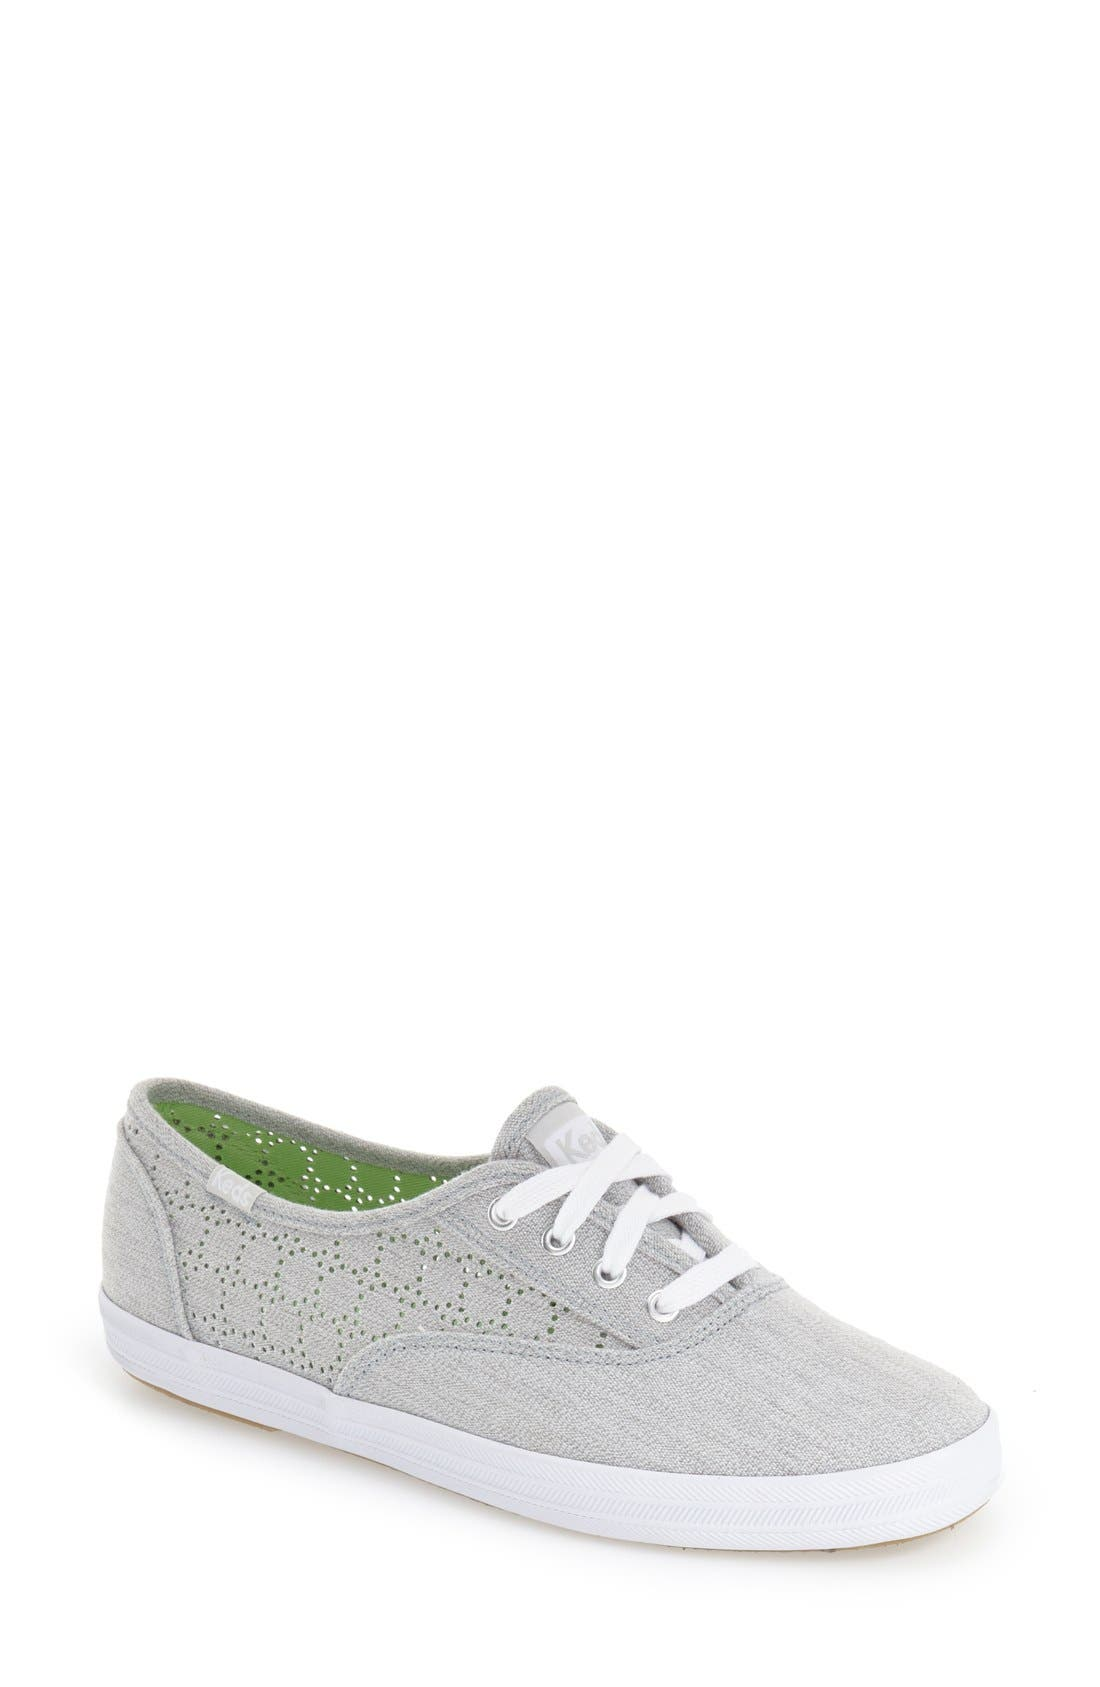 Alternate Image 1 Selected - Keds® 'Champion' Perforated Sneaker (Women)